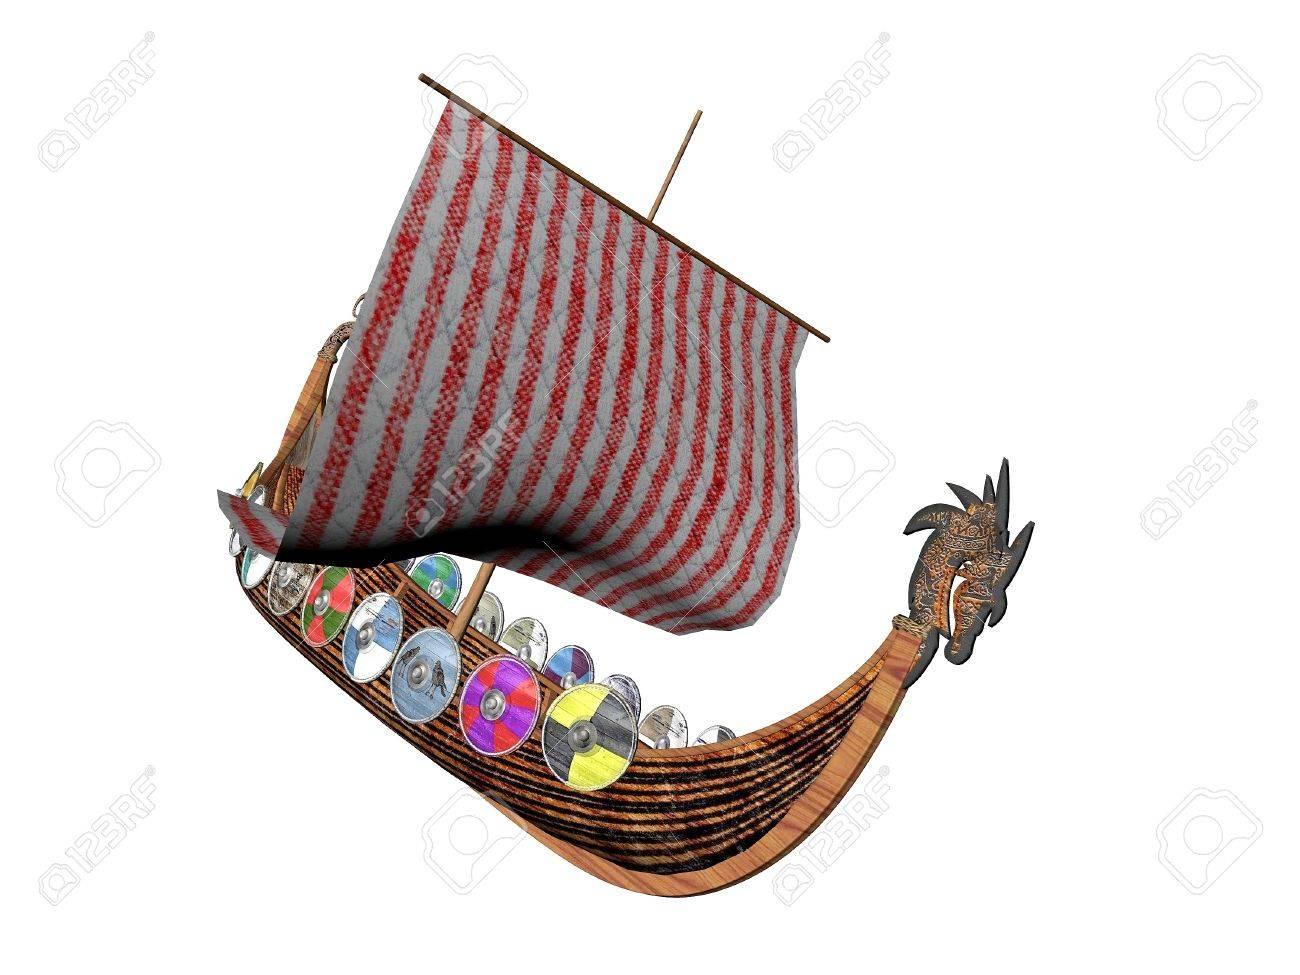 viking dragon ship raider isolated over white stock photo picture